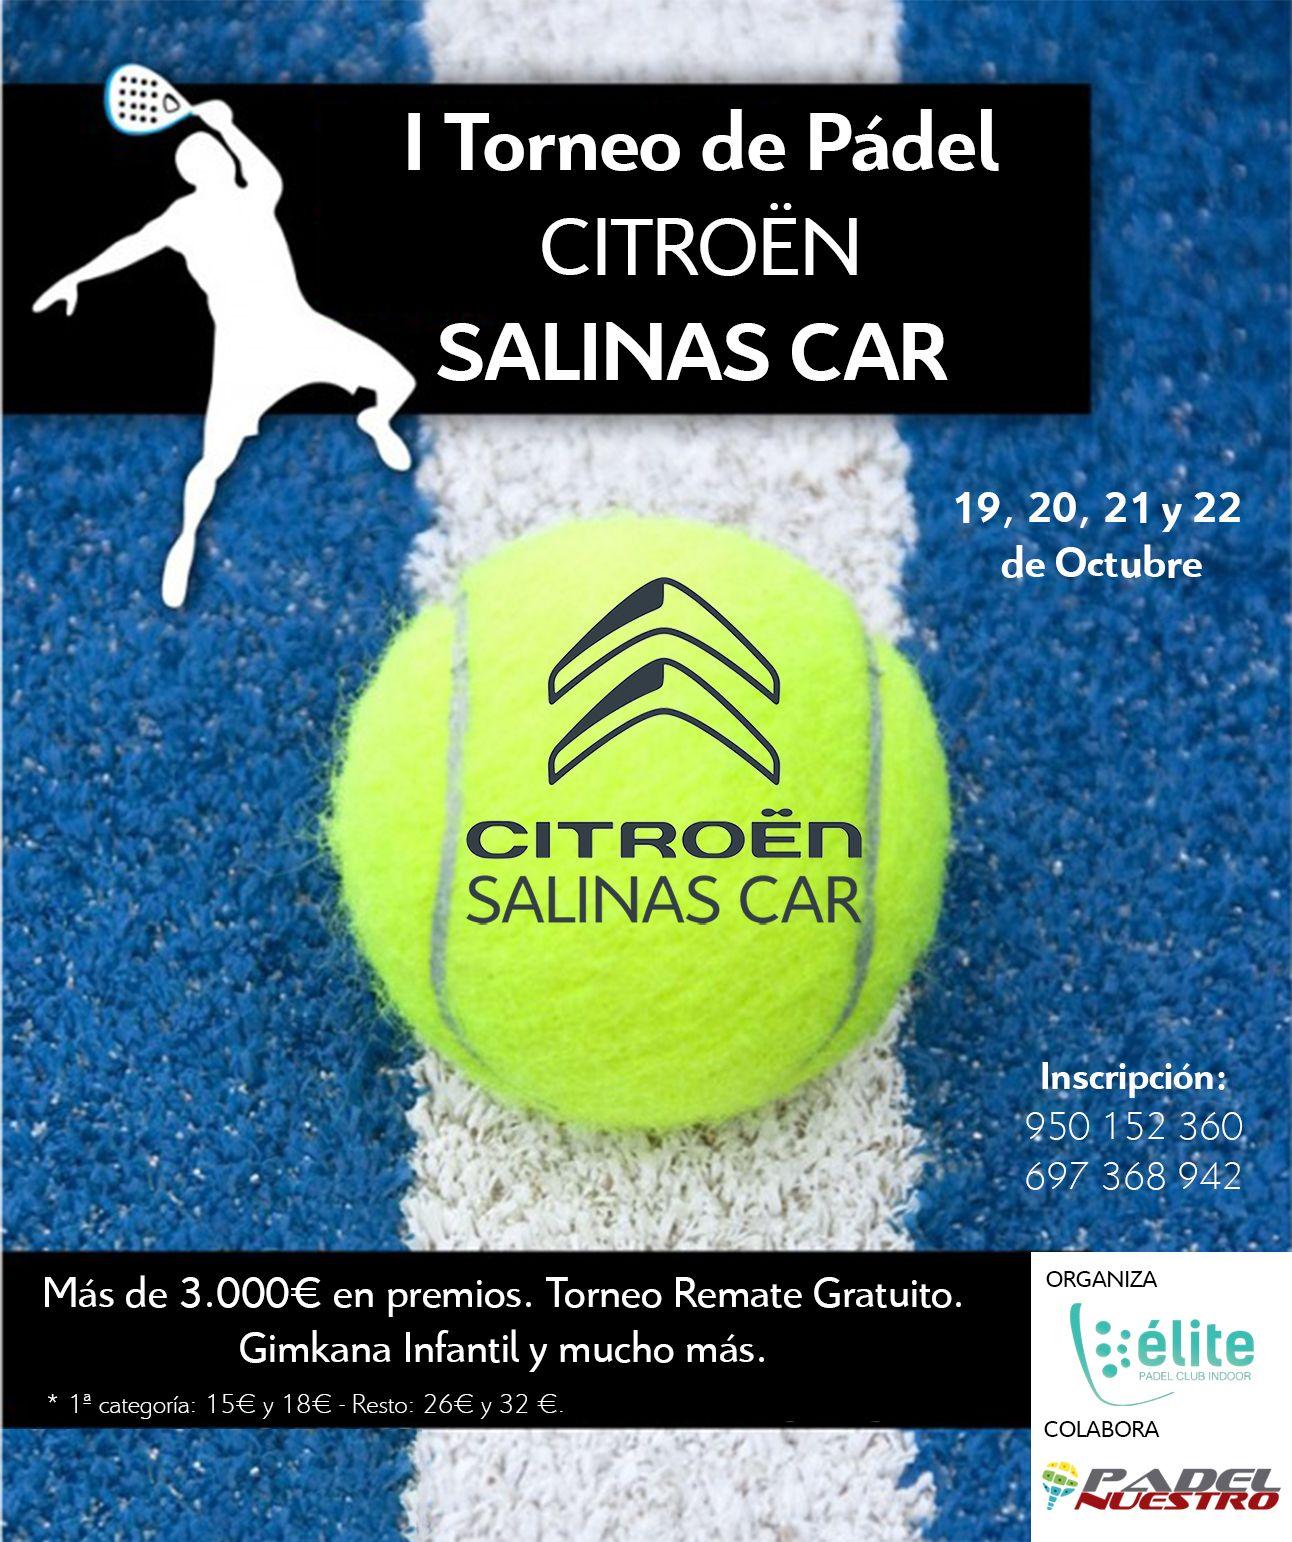 Nace el I Torneo de Pádel Indoor Citroën Salinas Car